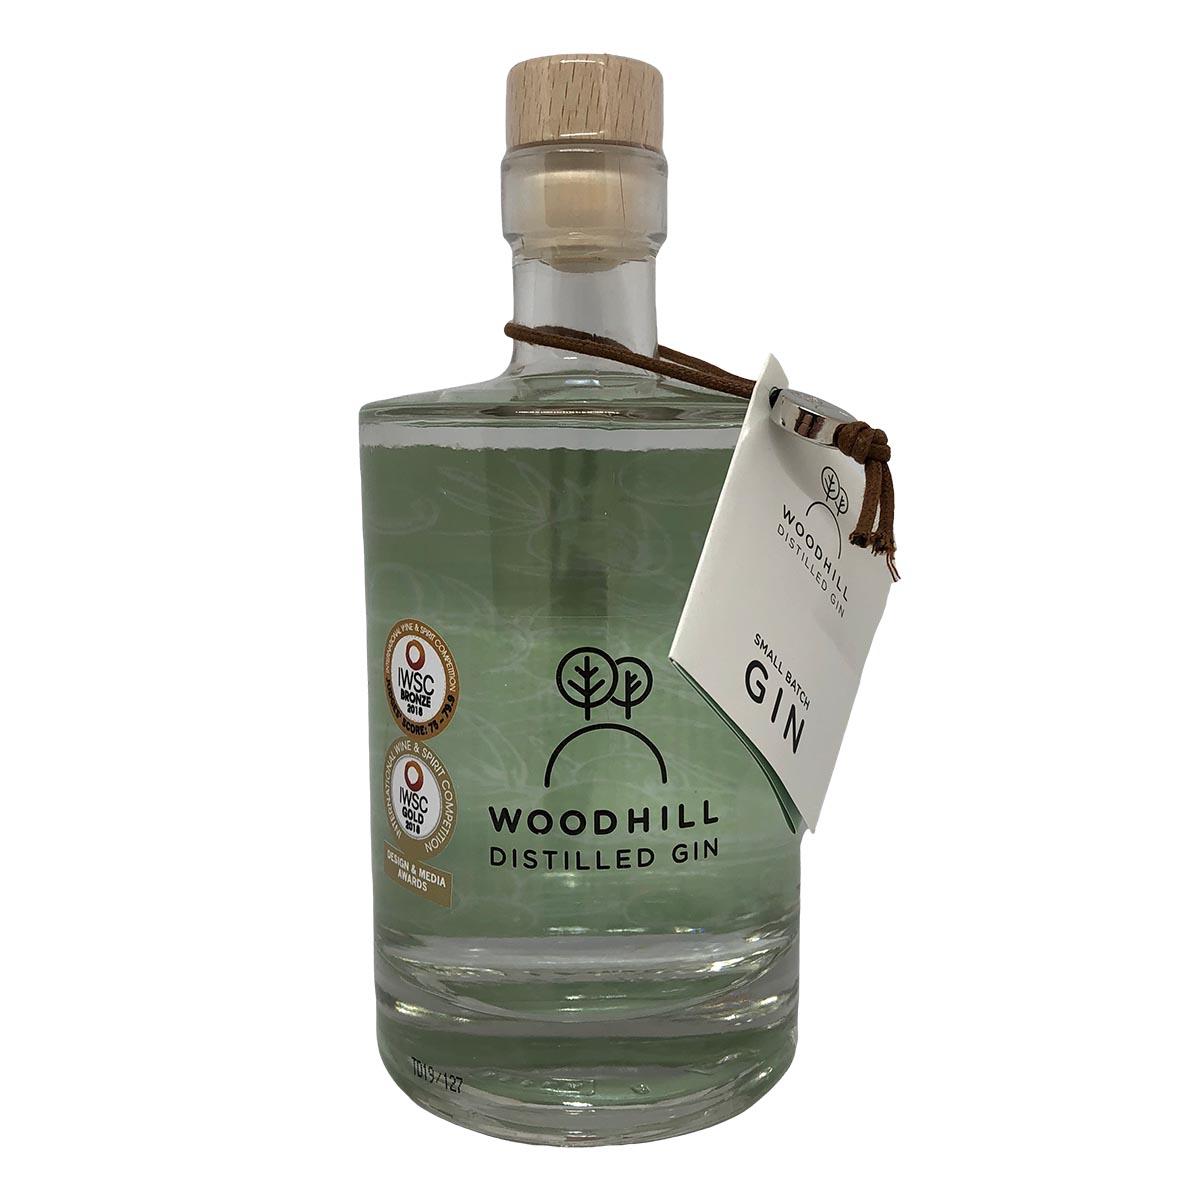 Woodhill Distilled Gin